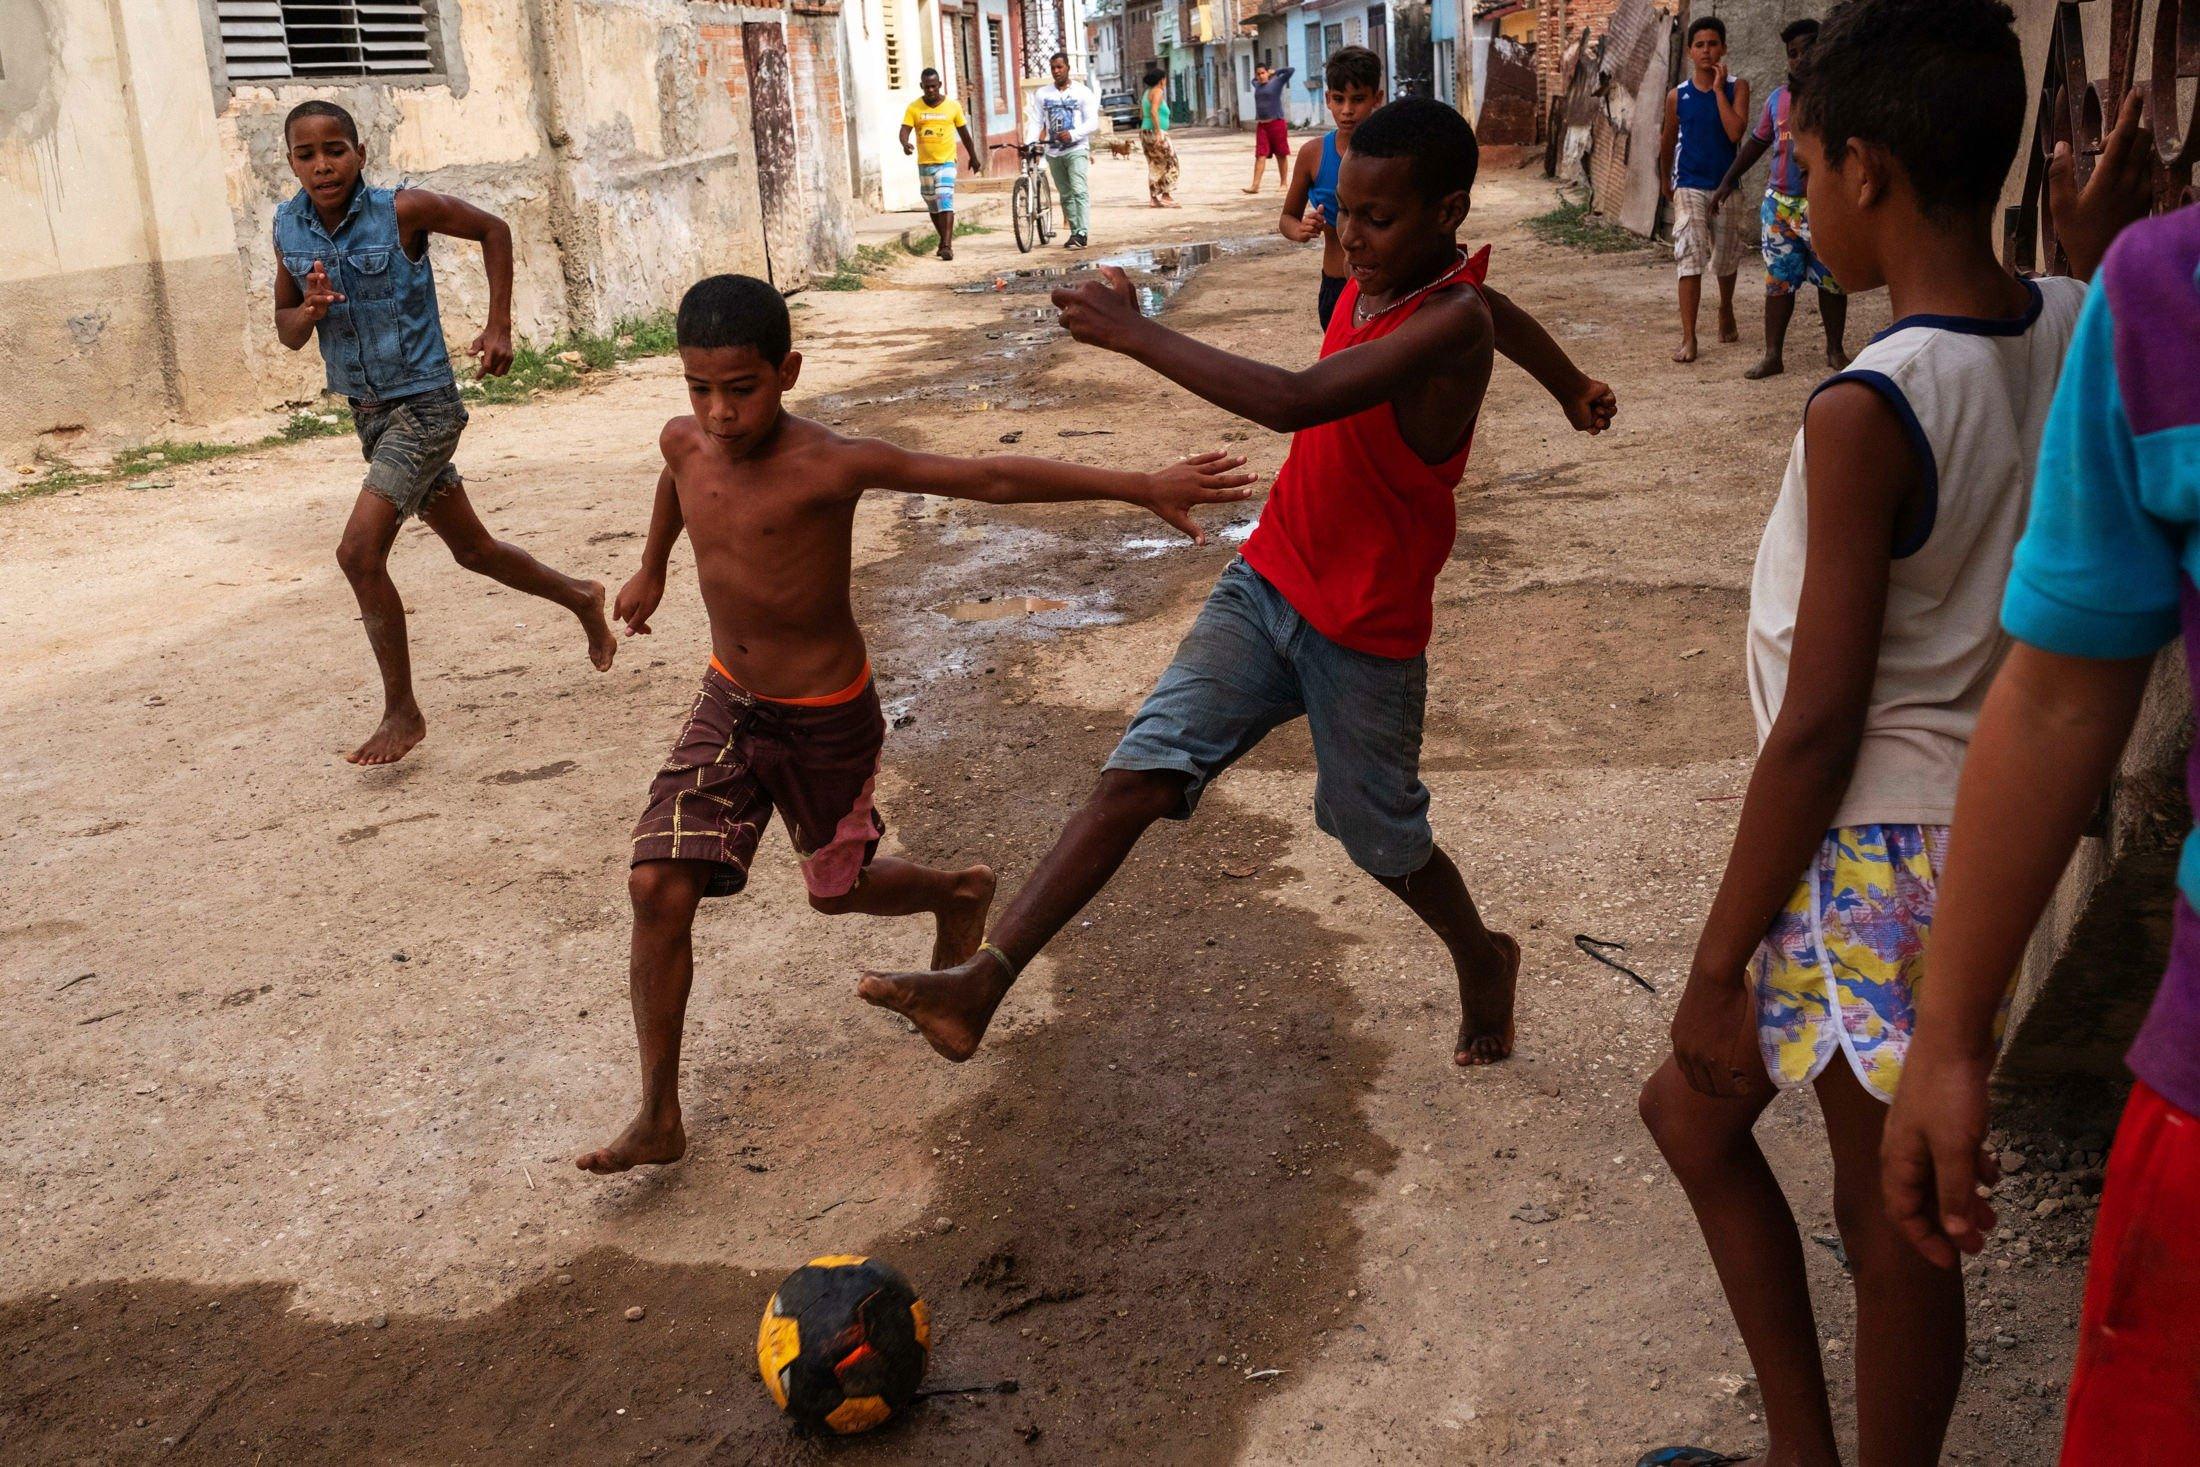 dynamic shot of children playing football